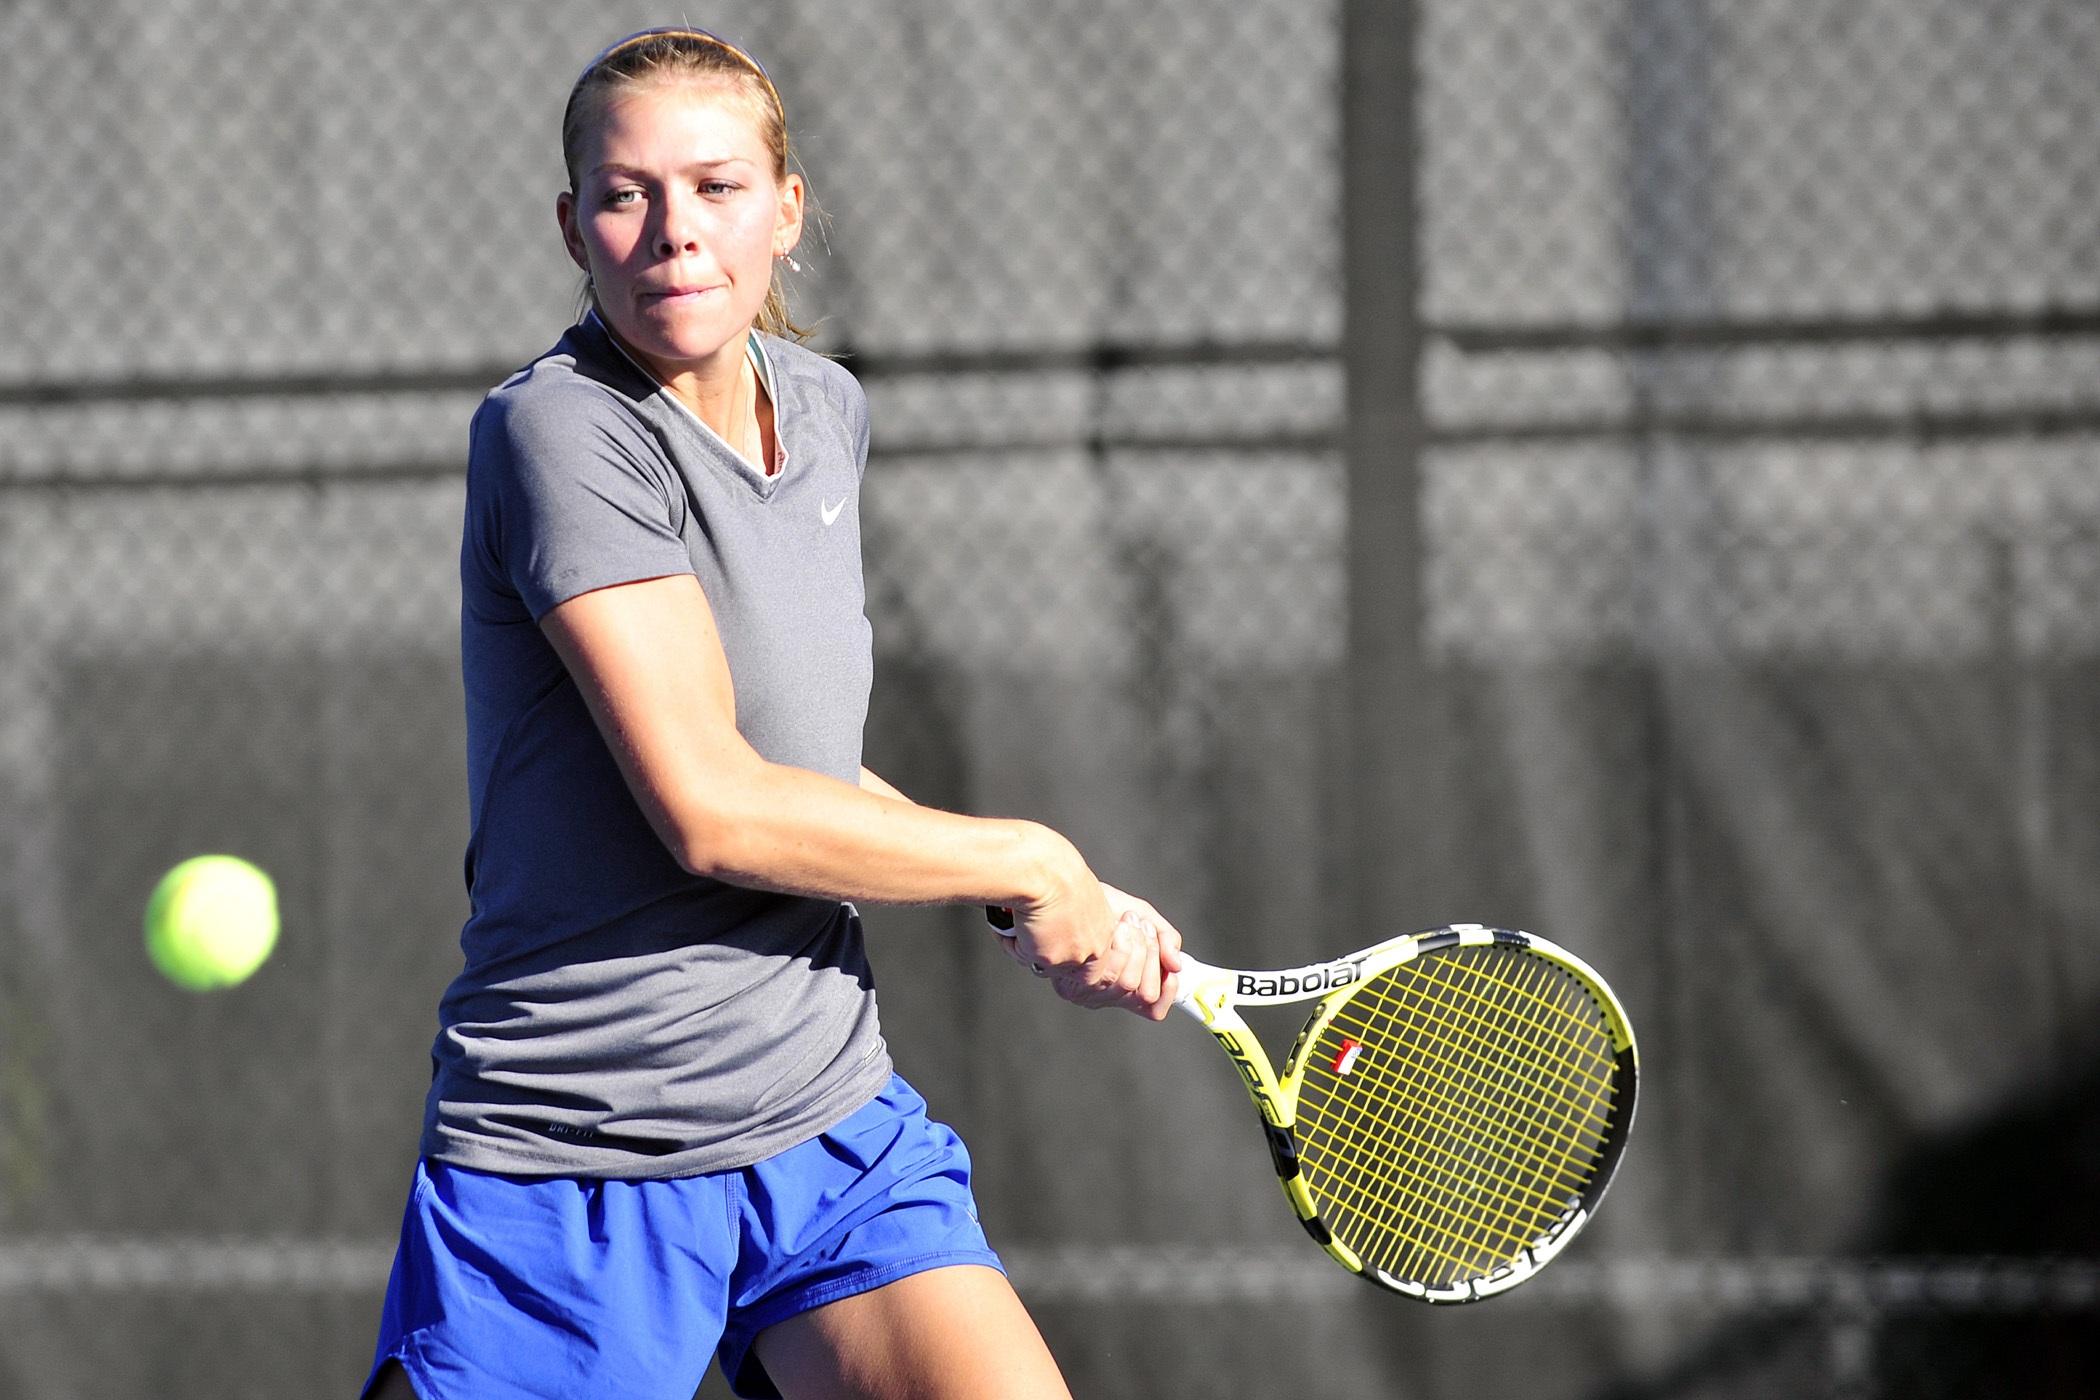 Tennis Match, Activity, Girl, Practice, Sport, HQ Photo